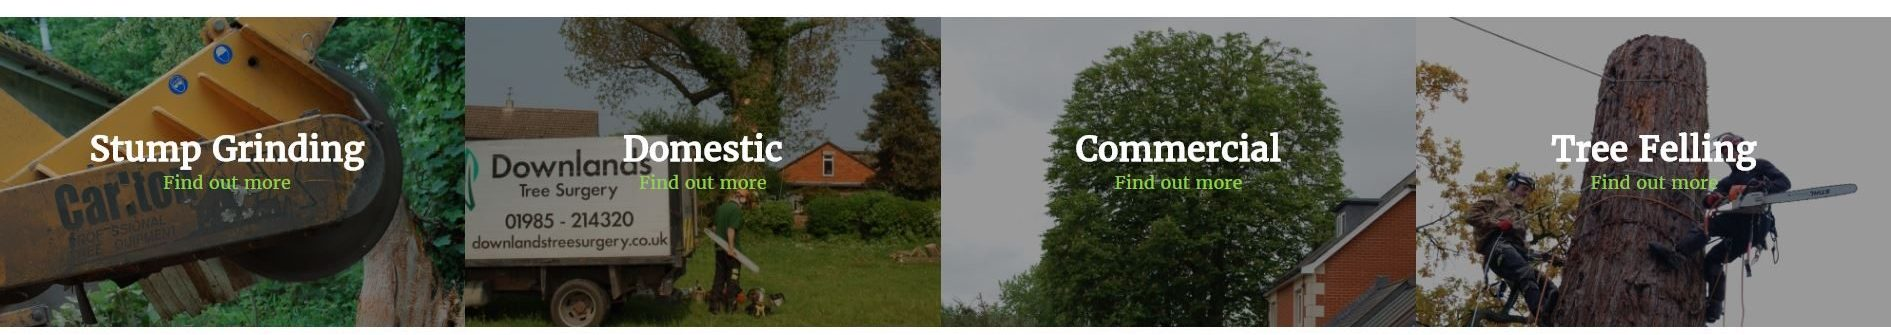 Downlands new website services